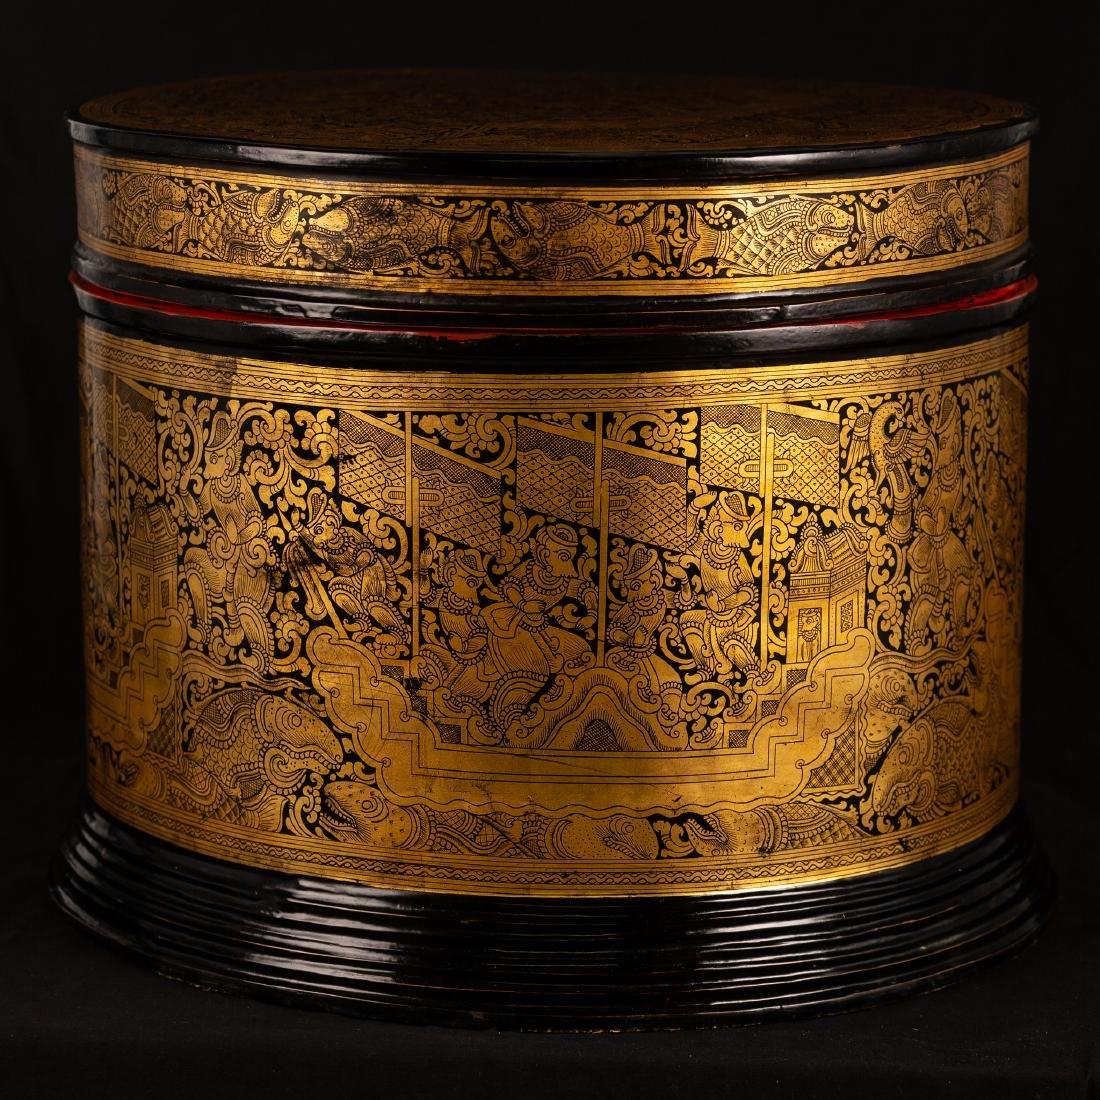 19th Century Burmese Lacquerware Monks Robe Box - 3